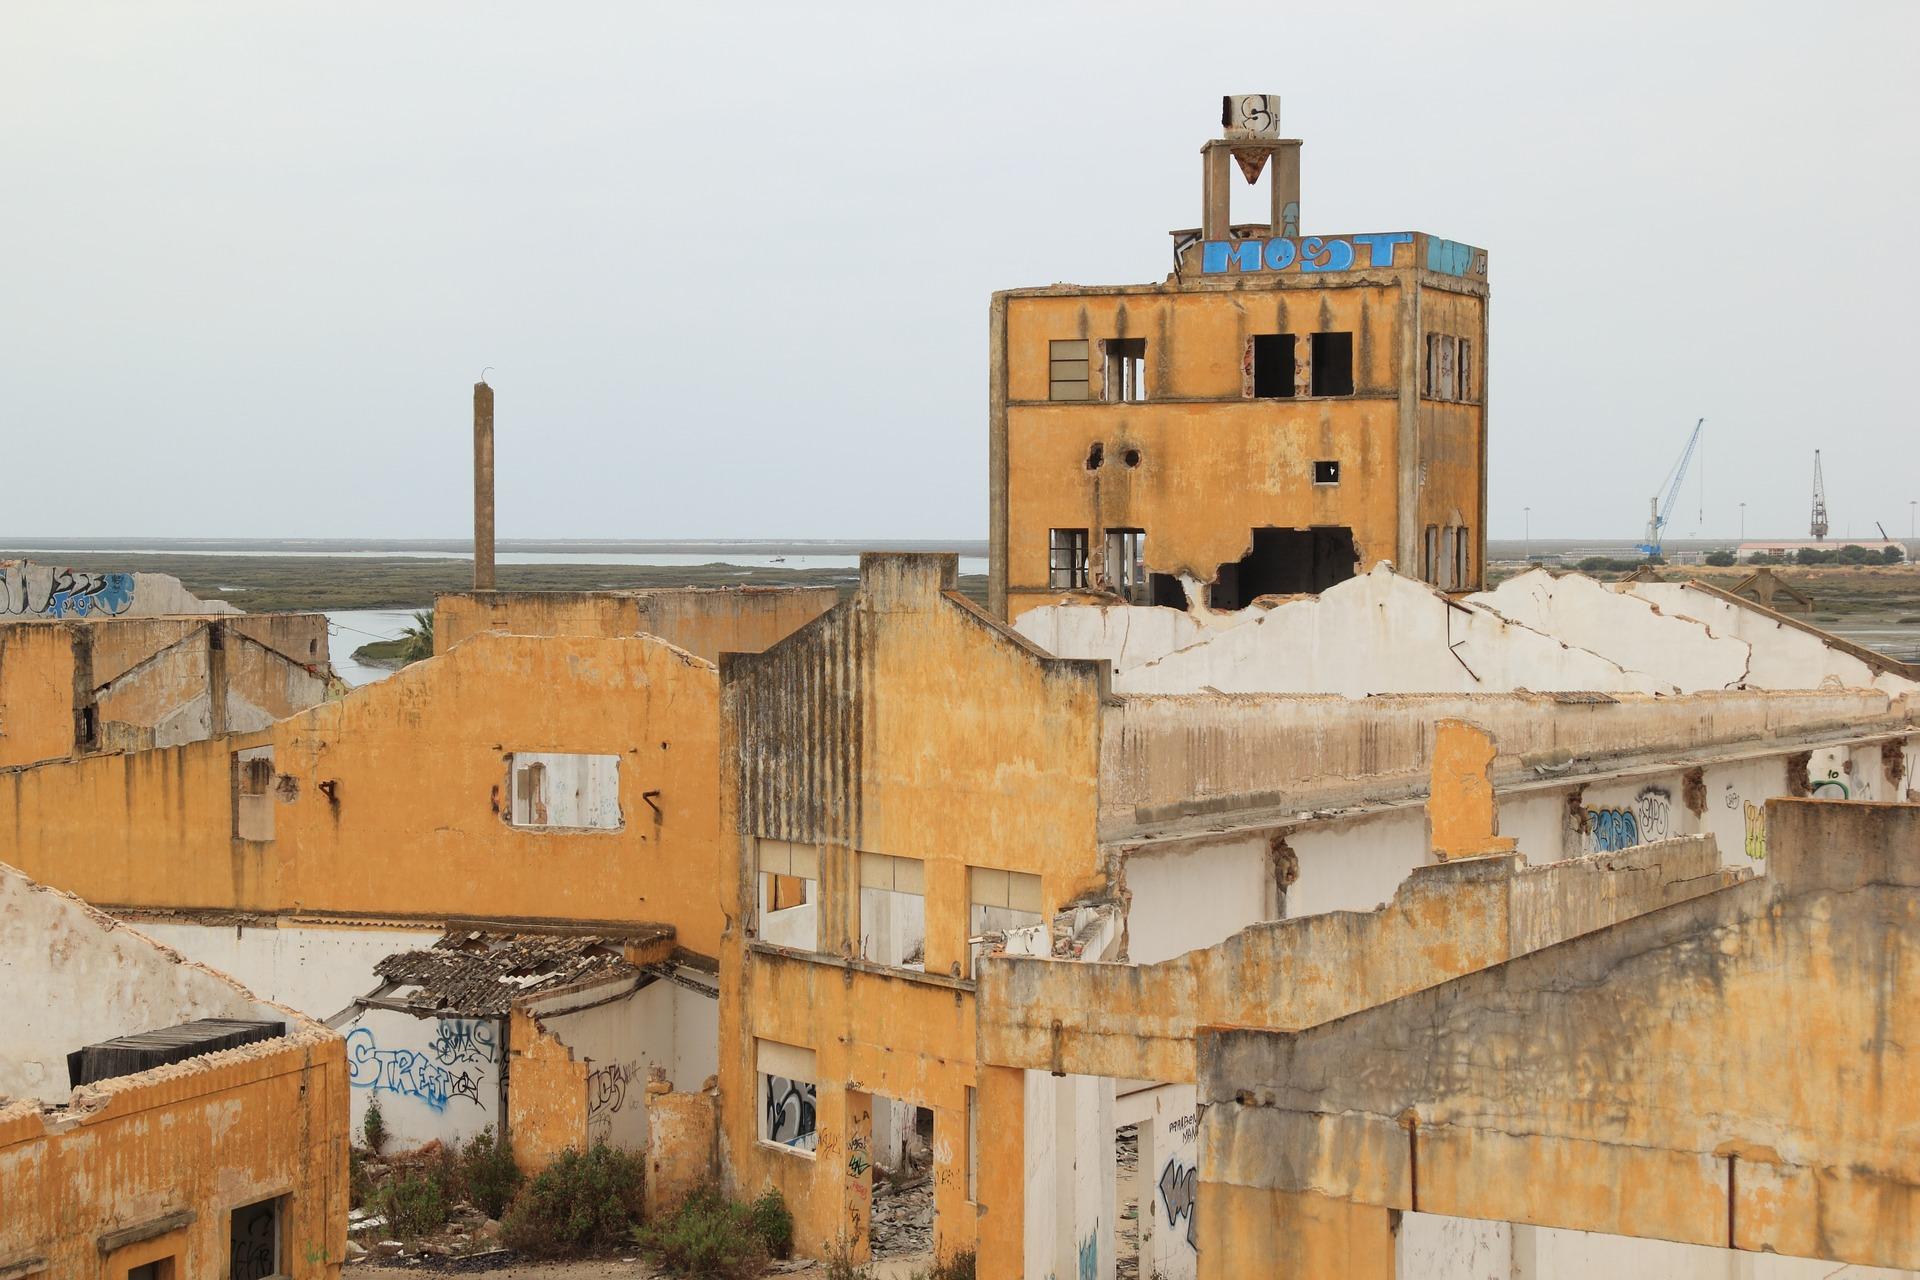 Abandoned Factory, Faro | © olafpictures / pixabay